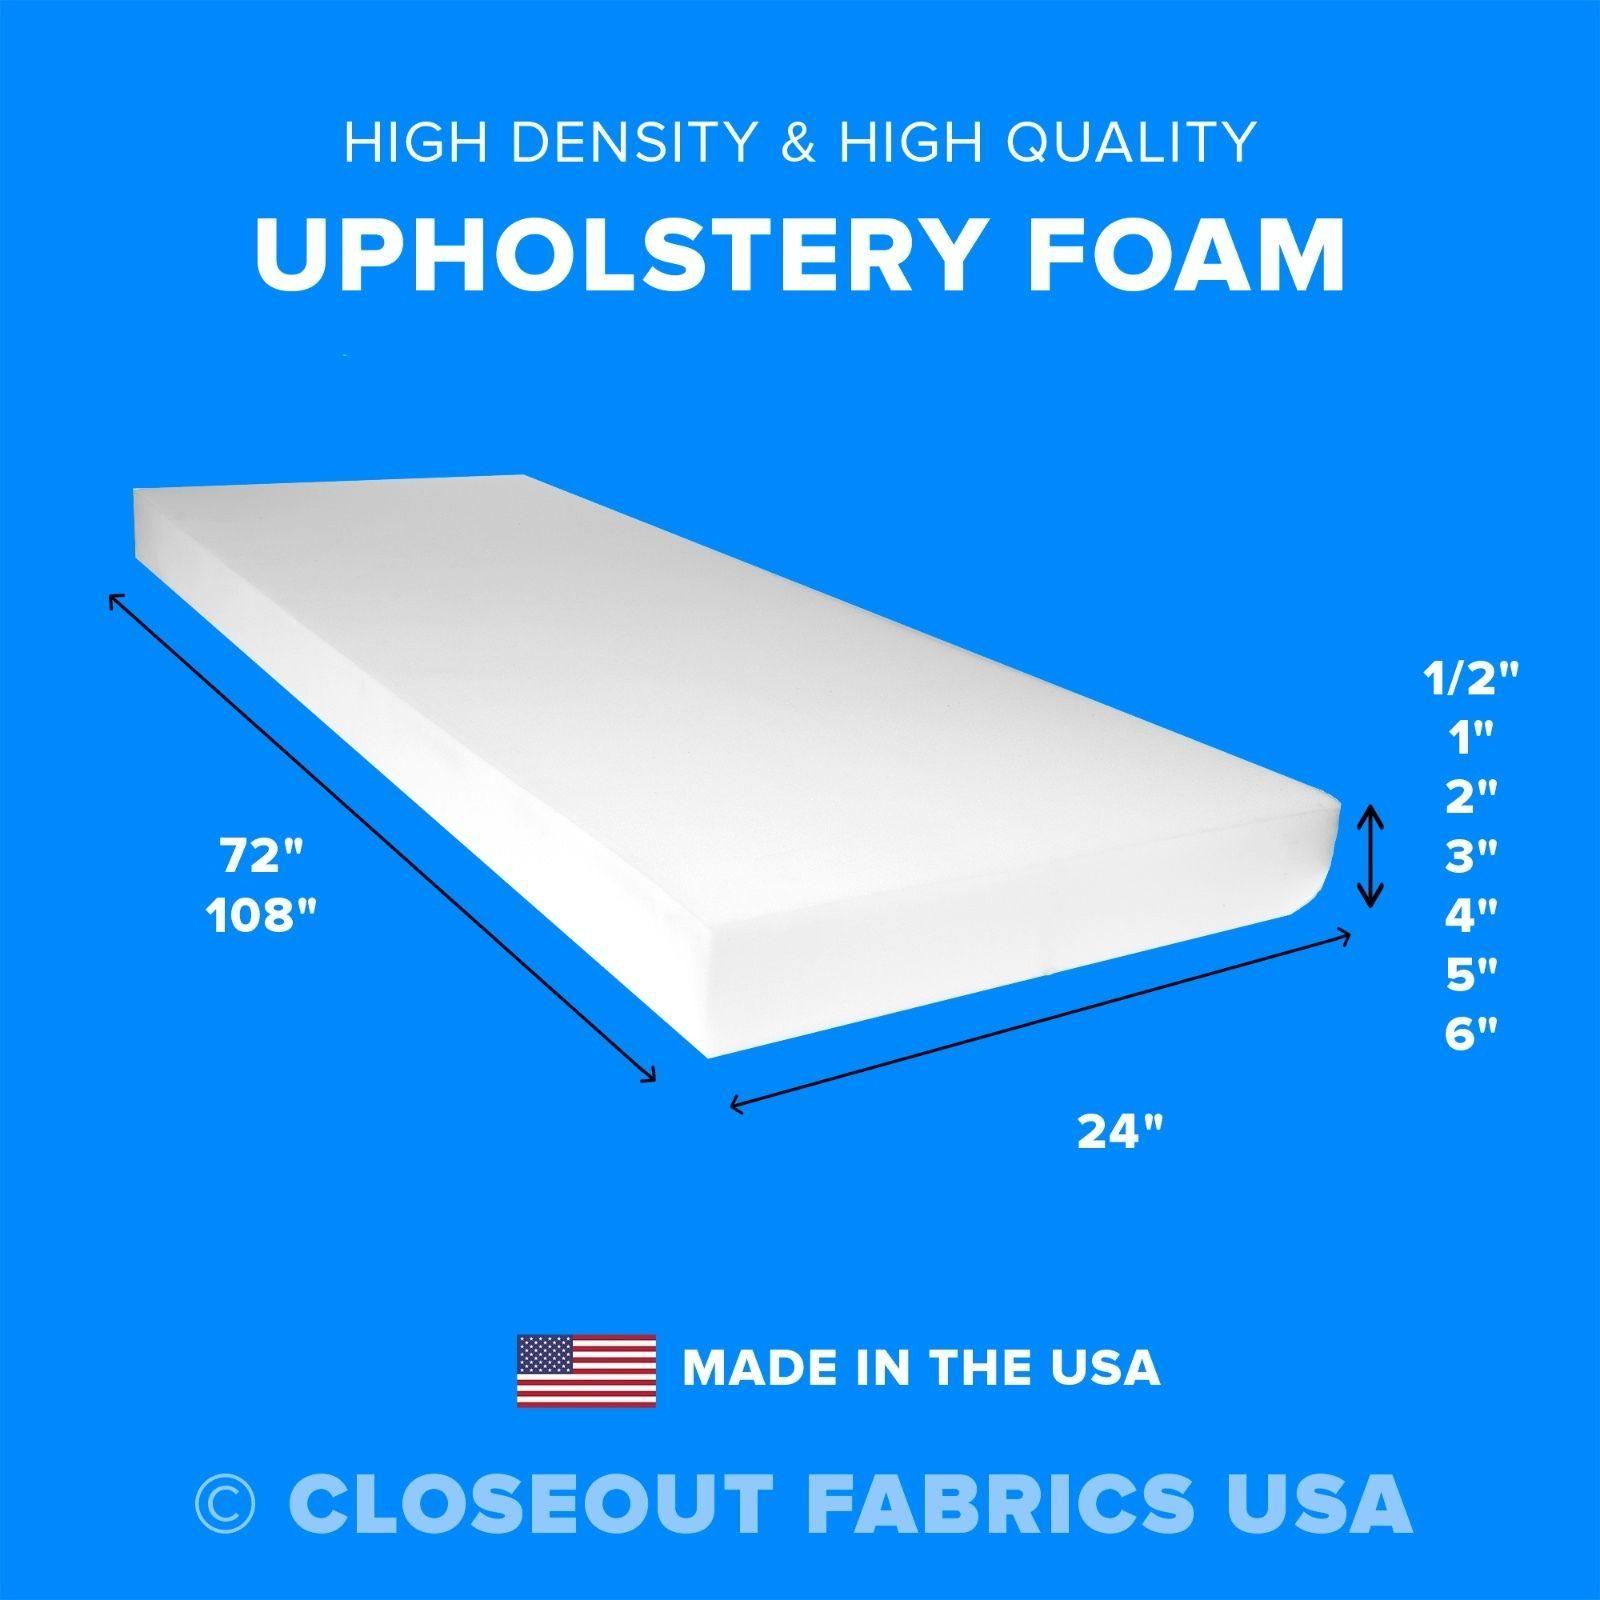 High Density Upholstery Foam Seat Cushion Replacement Sheets Upholstery Foam Upholstery Cushions On Sofa